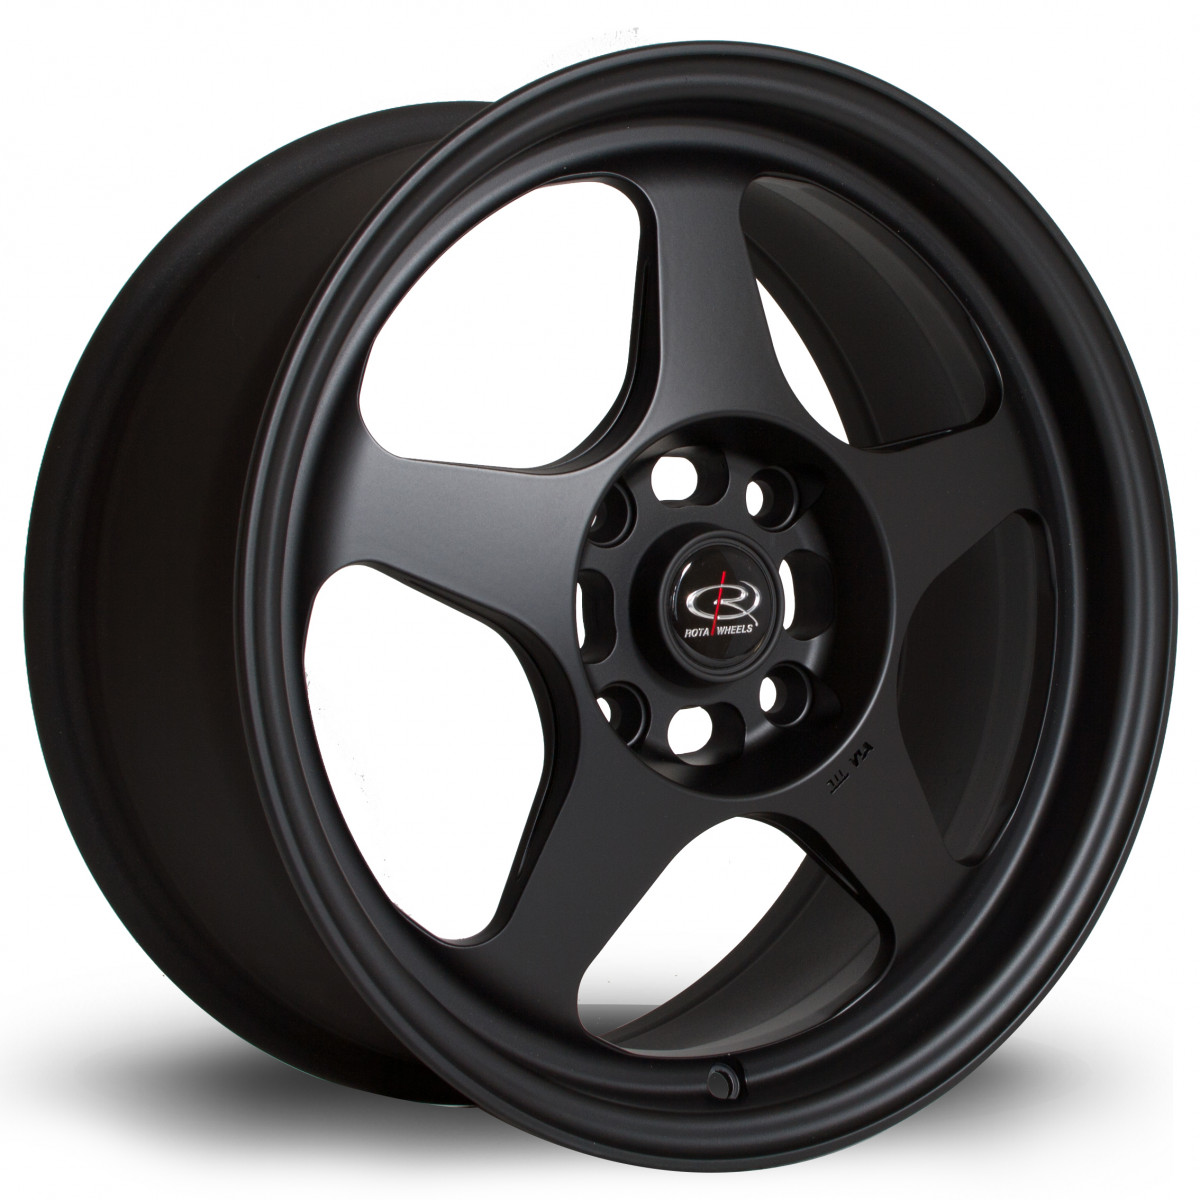 Slip 16x7 4x114 ET40 Flat Black